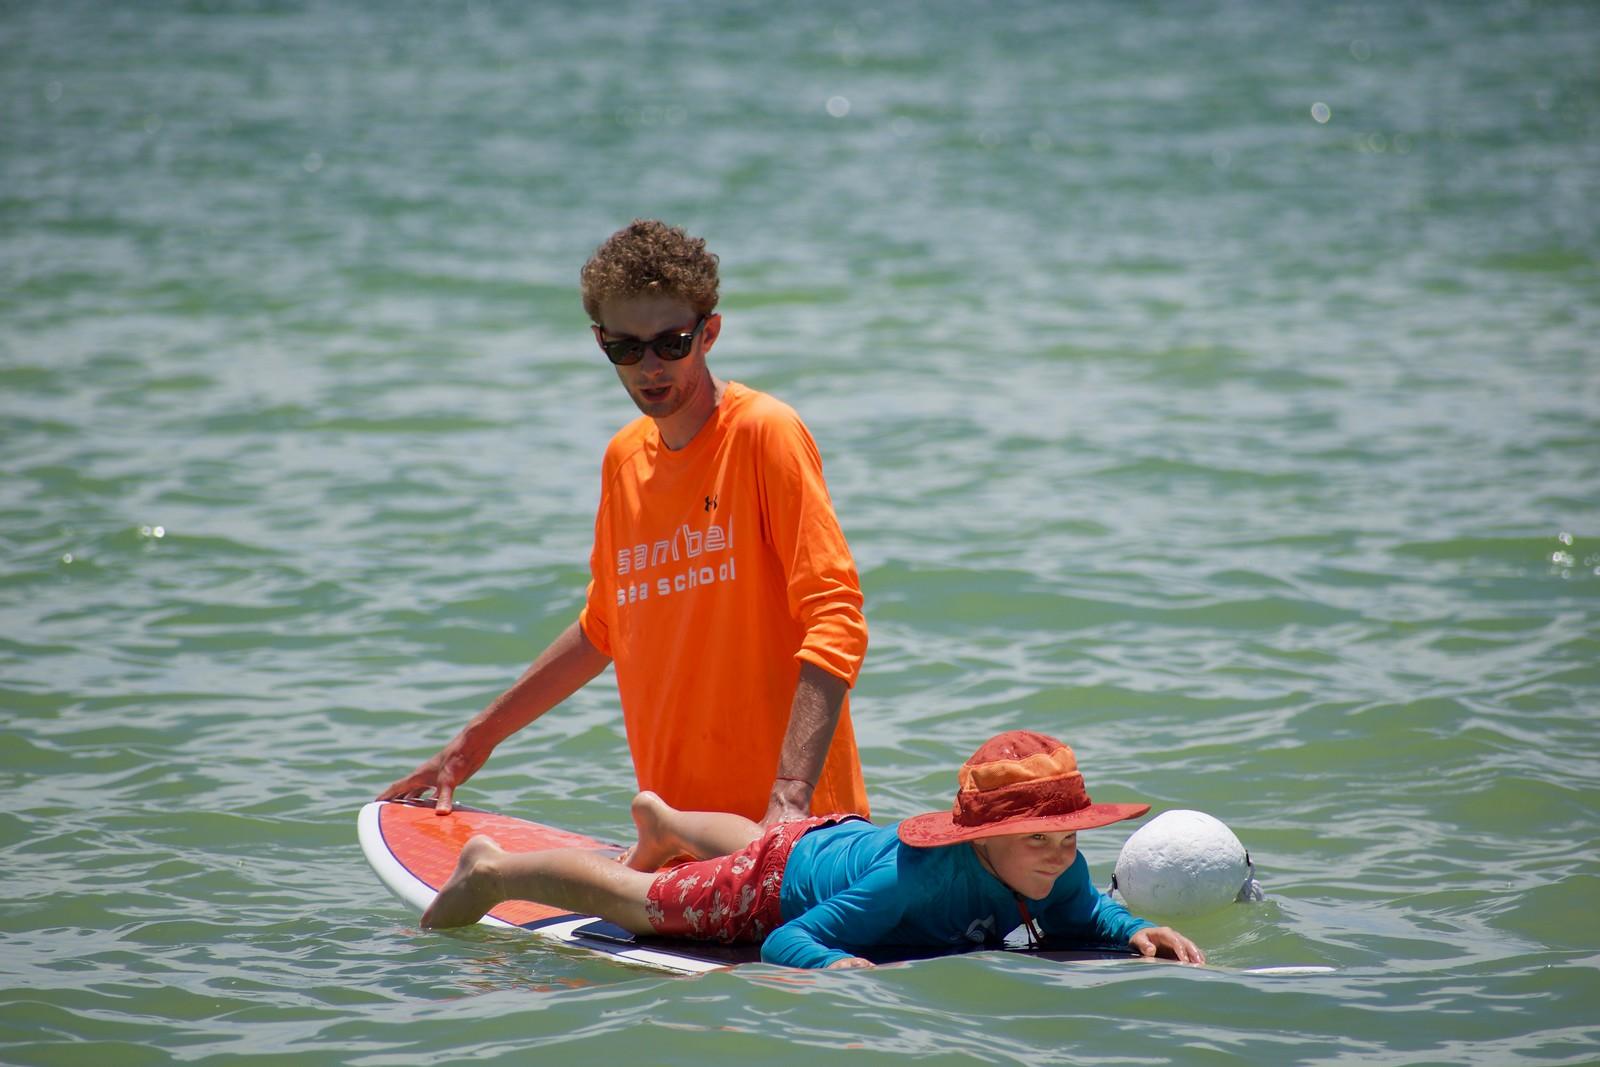 Sanibel Sea School will offer surfing lessons in September.